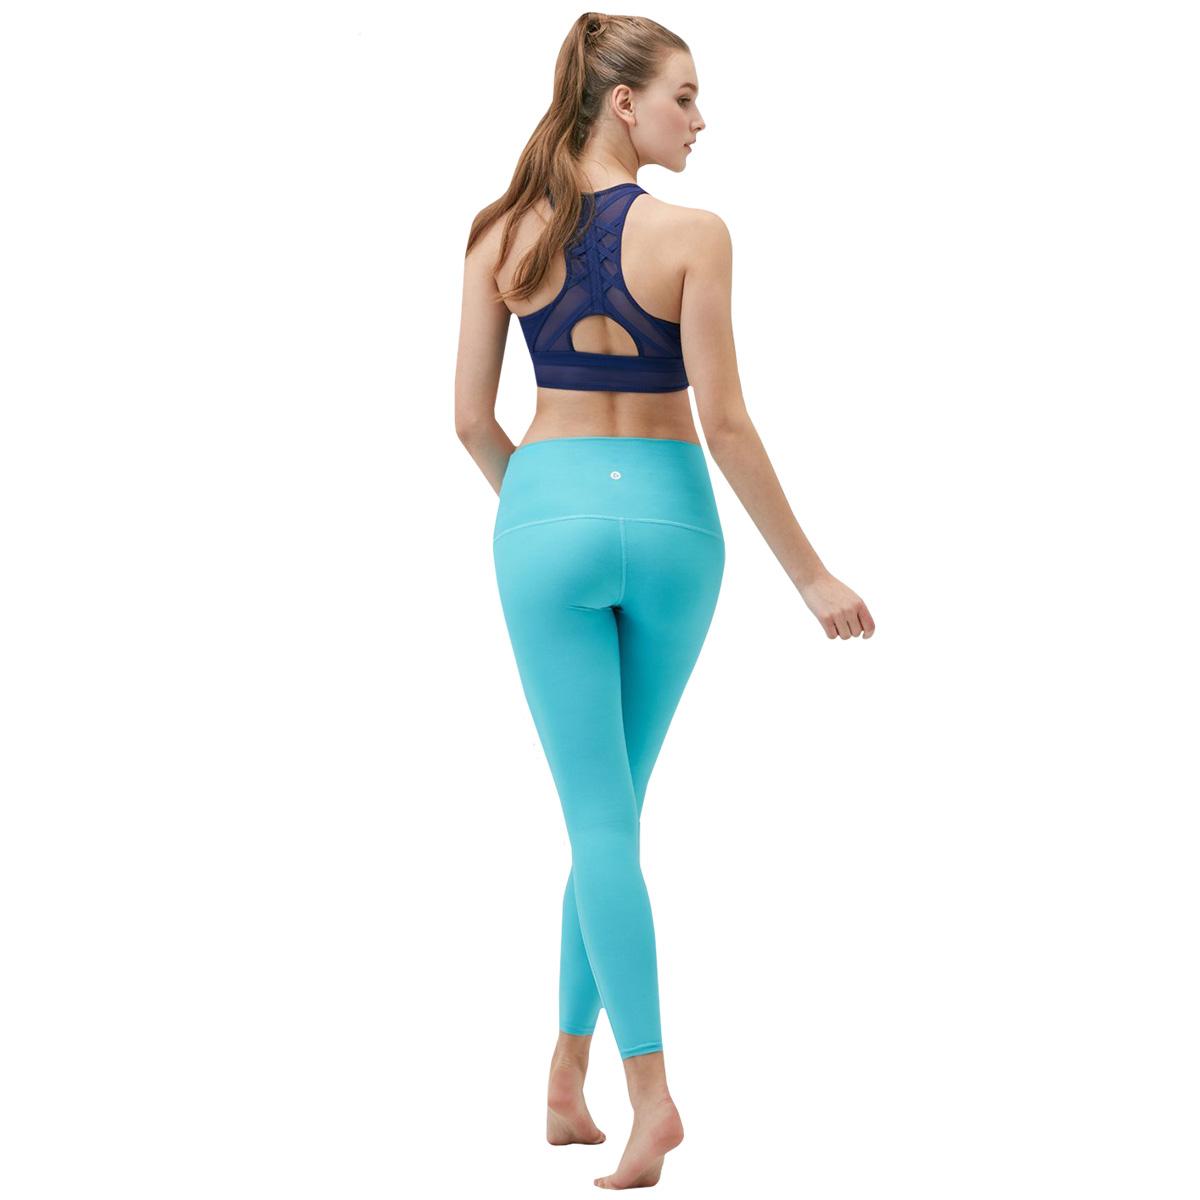 thumbnail 5 - TSLA Tesla FYP42 Women's High-Waisted Ultra-Stretch Tummy Control Yoga Pants